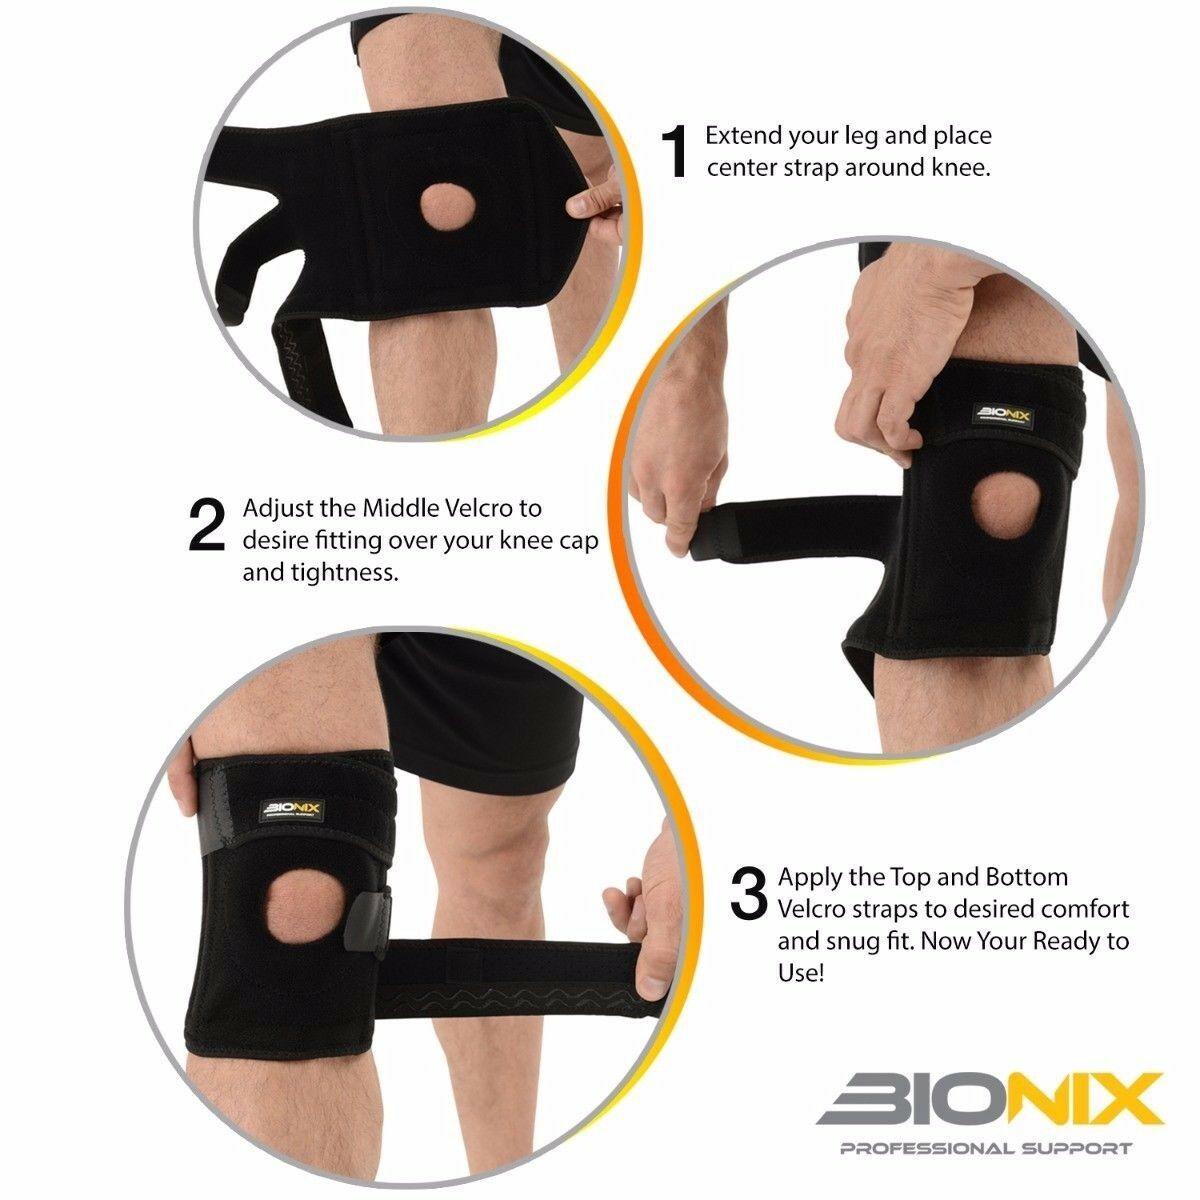 Patella Knee Support Tendon Neoprene Brace Strap Reviews